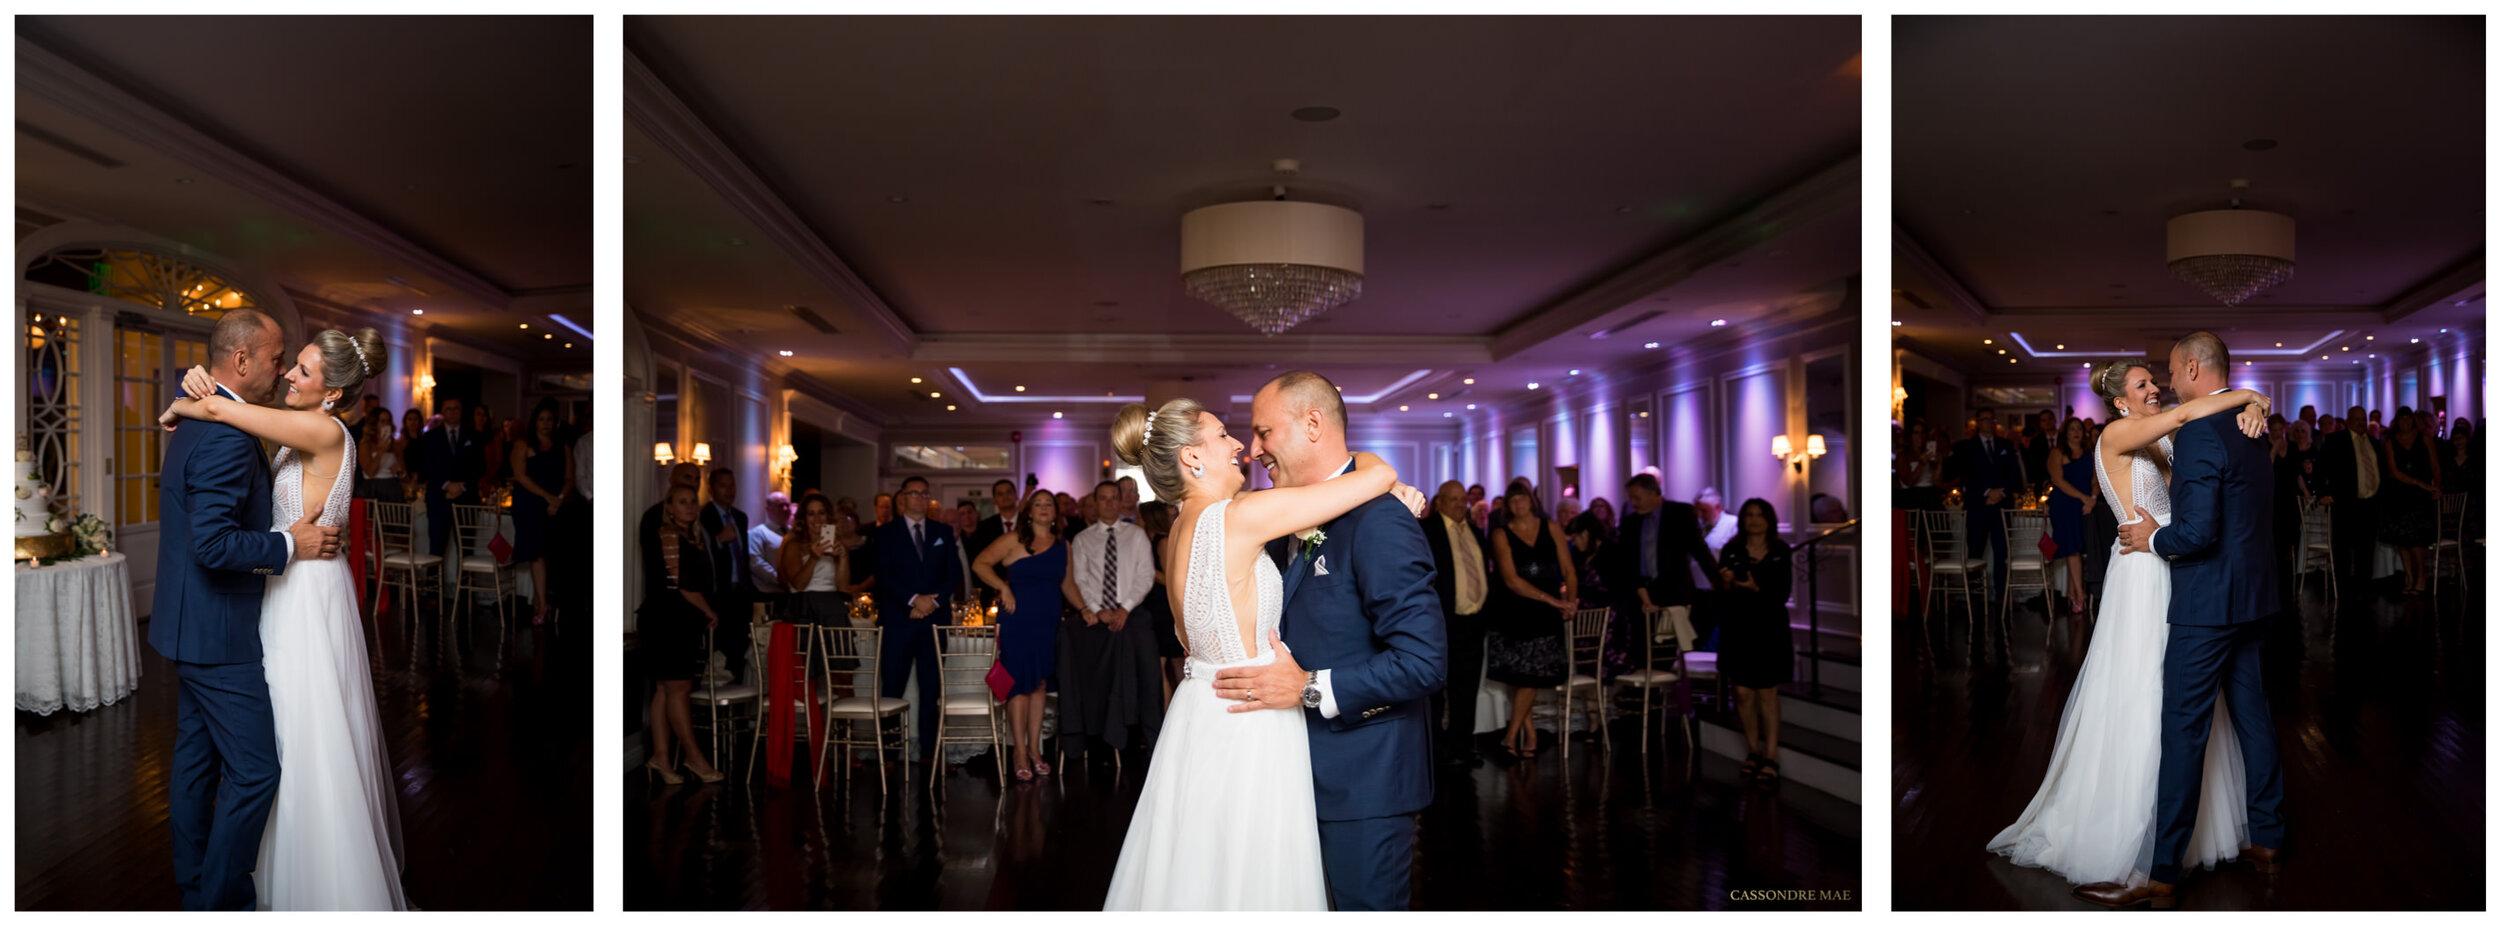 Cassondre Mae Photography Briarcliff Manor Wedding Photographer 22.jpg